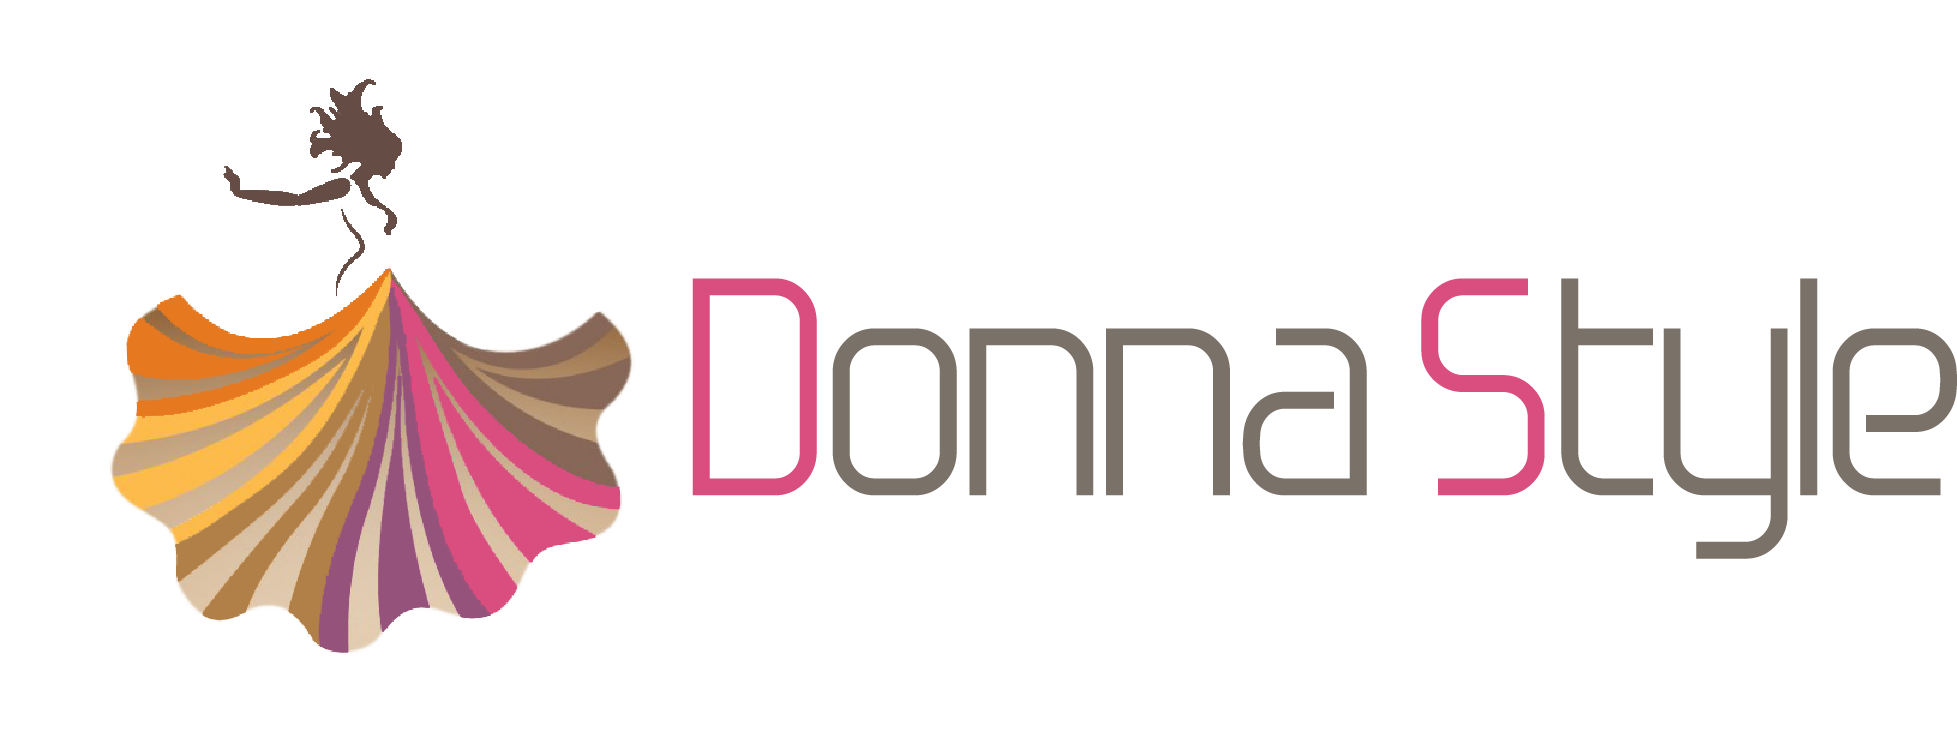 Boutique Donna Style